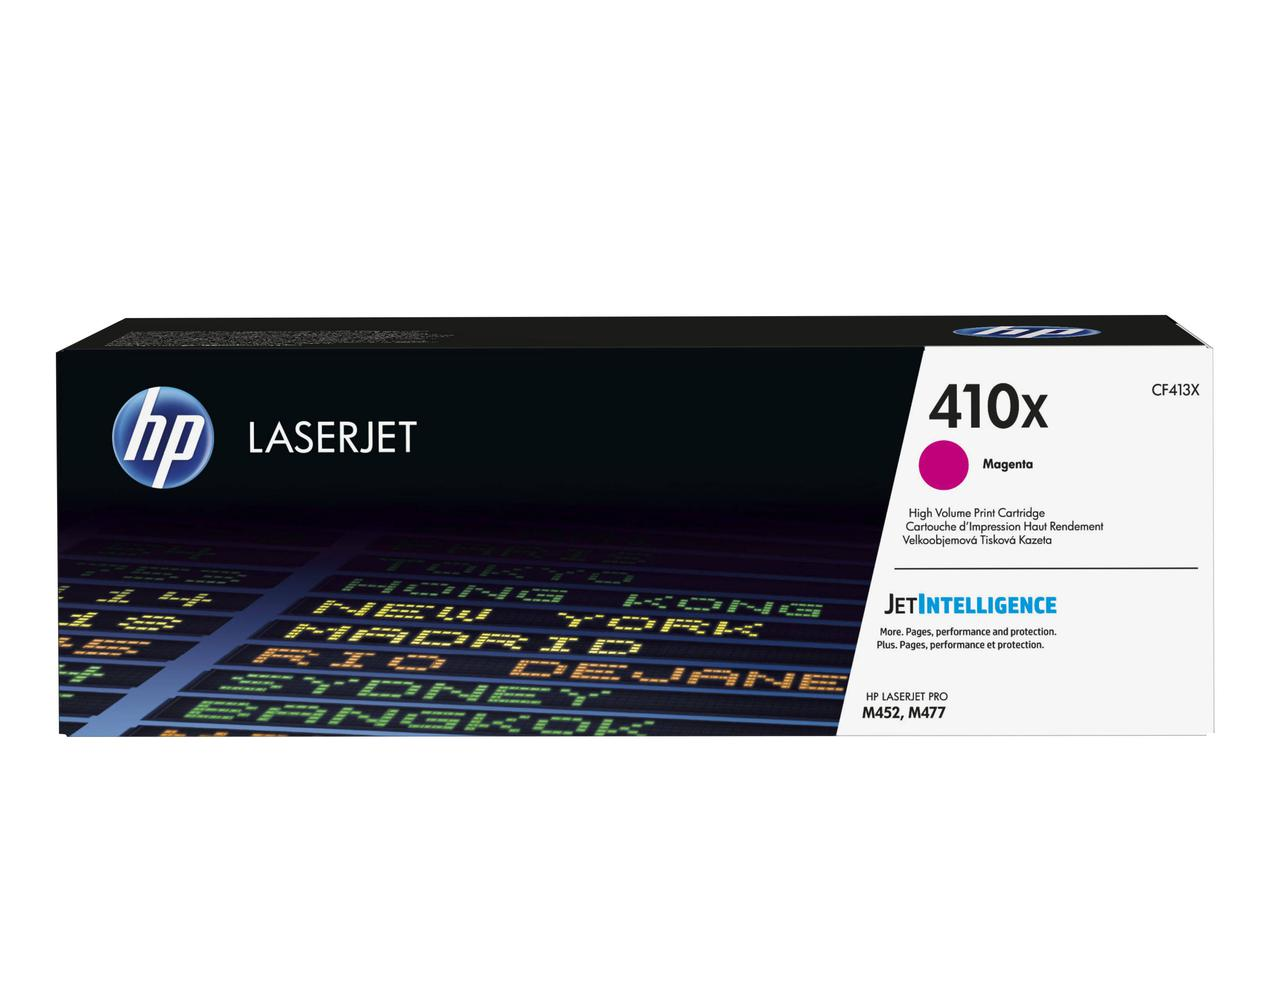 Картридж HP Laser/magenta CF413X